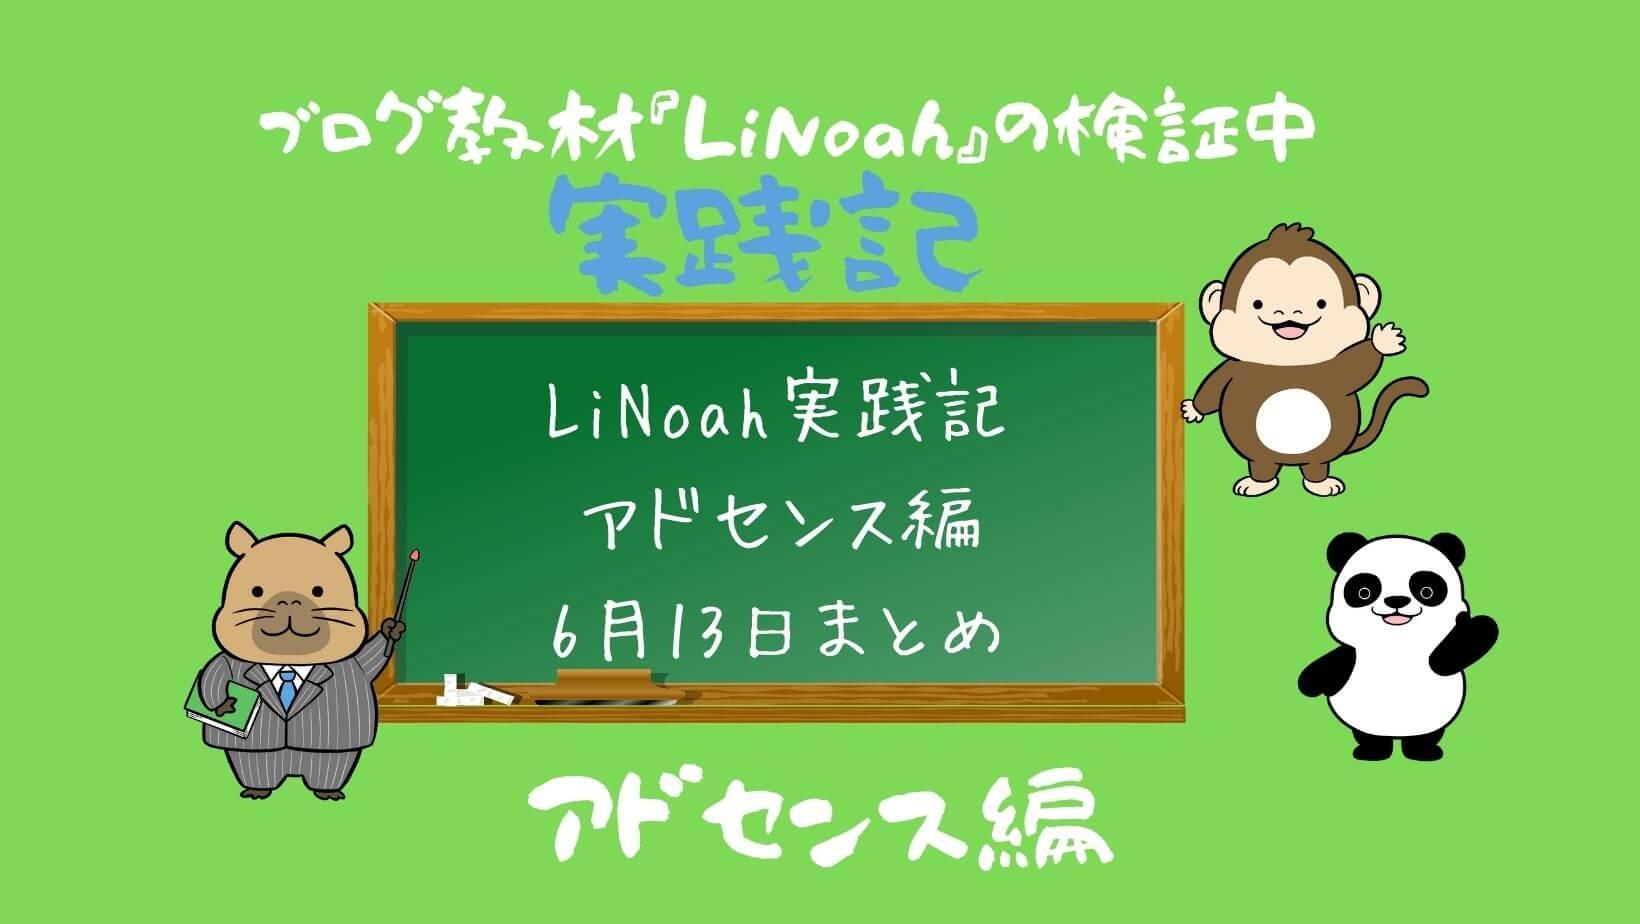 LiNoah実践記アドセンス編6月13日まとめ